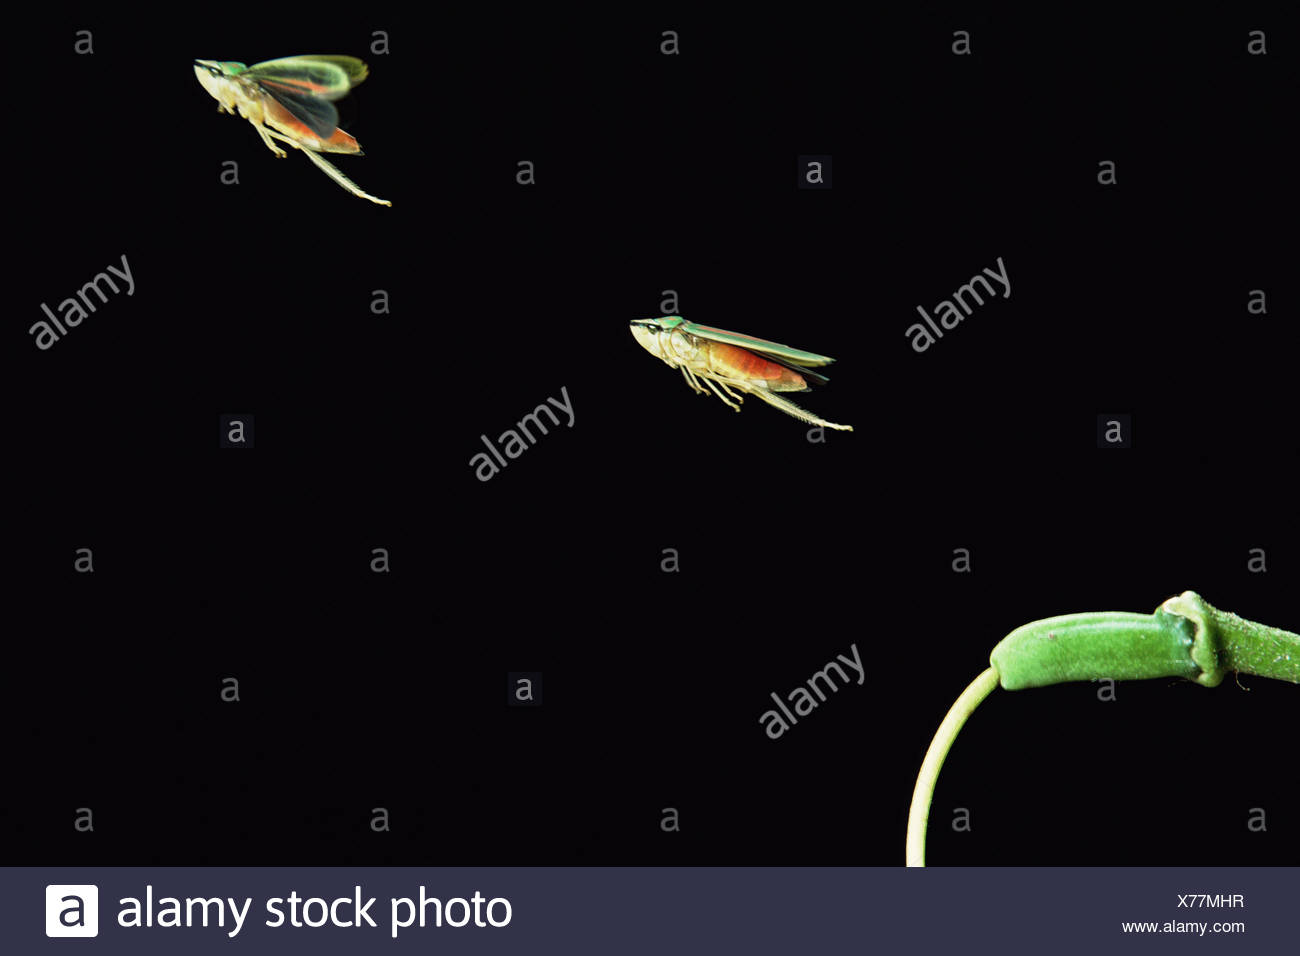 Rote gebänderten Blatt-Trichter (Graphocephala Coccinea) springen, Doppelbelichtung. In Gefangenschaft, UK Stockbild